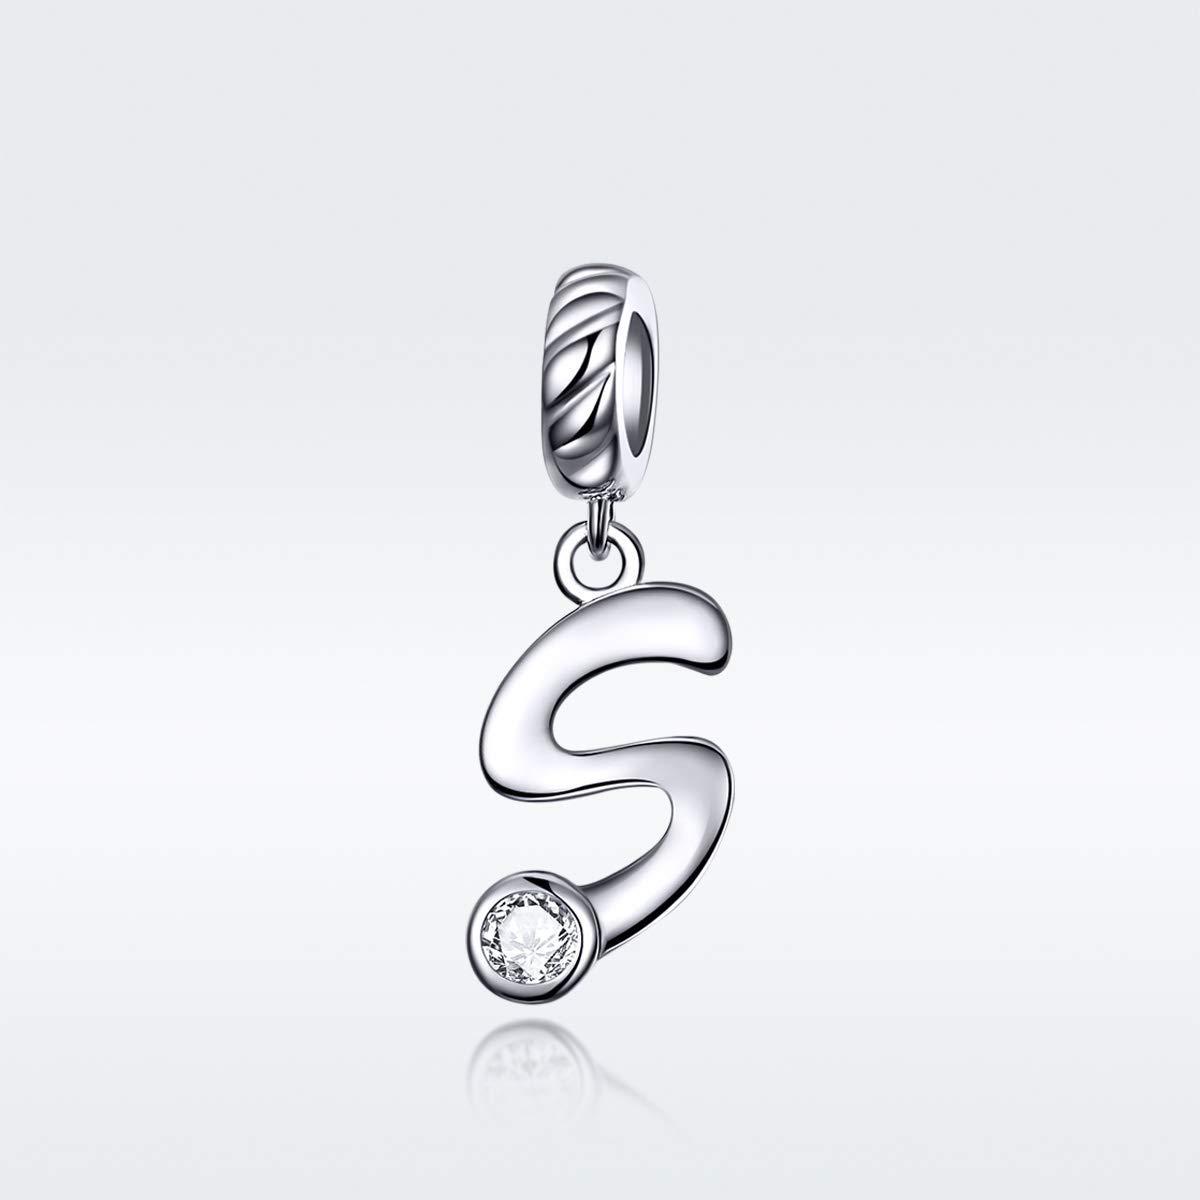 CHENGMEN Alphabet Letter A-Z Pendant with Clear Cubic Zirconia 925 Sterling Silver Charms European Bracelets Compatible